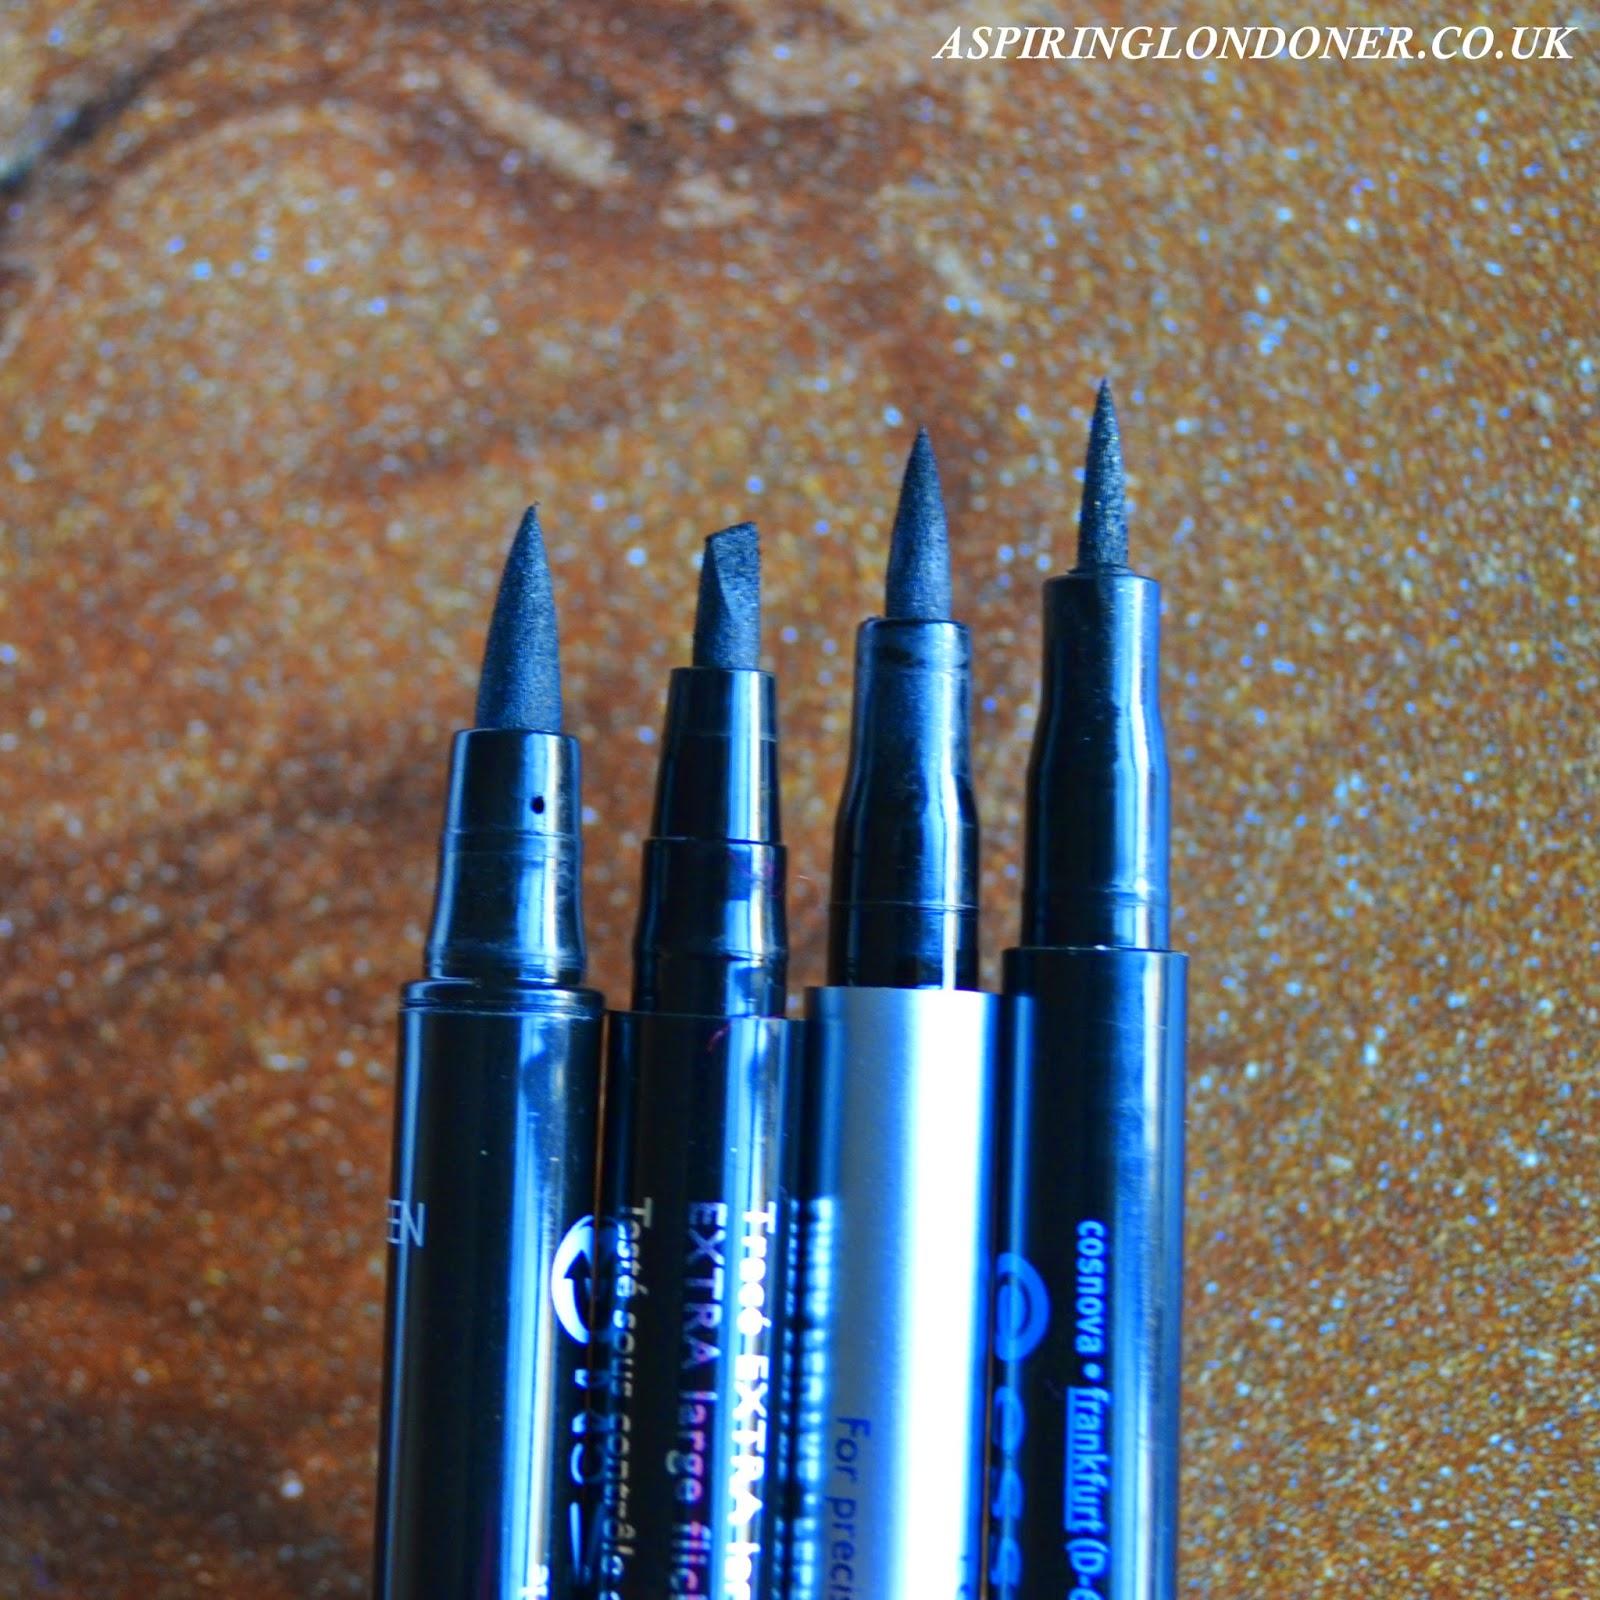 Eyeliner Pens ft Seventeen, Eyeko, Bourjois & Essence Swatch - Aspiring Londoner